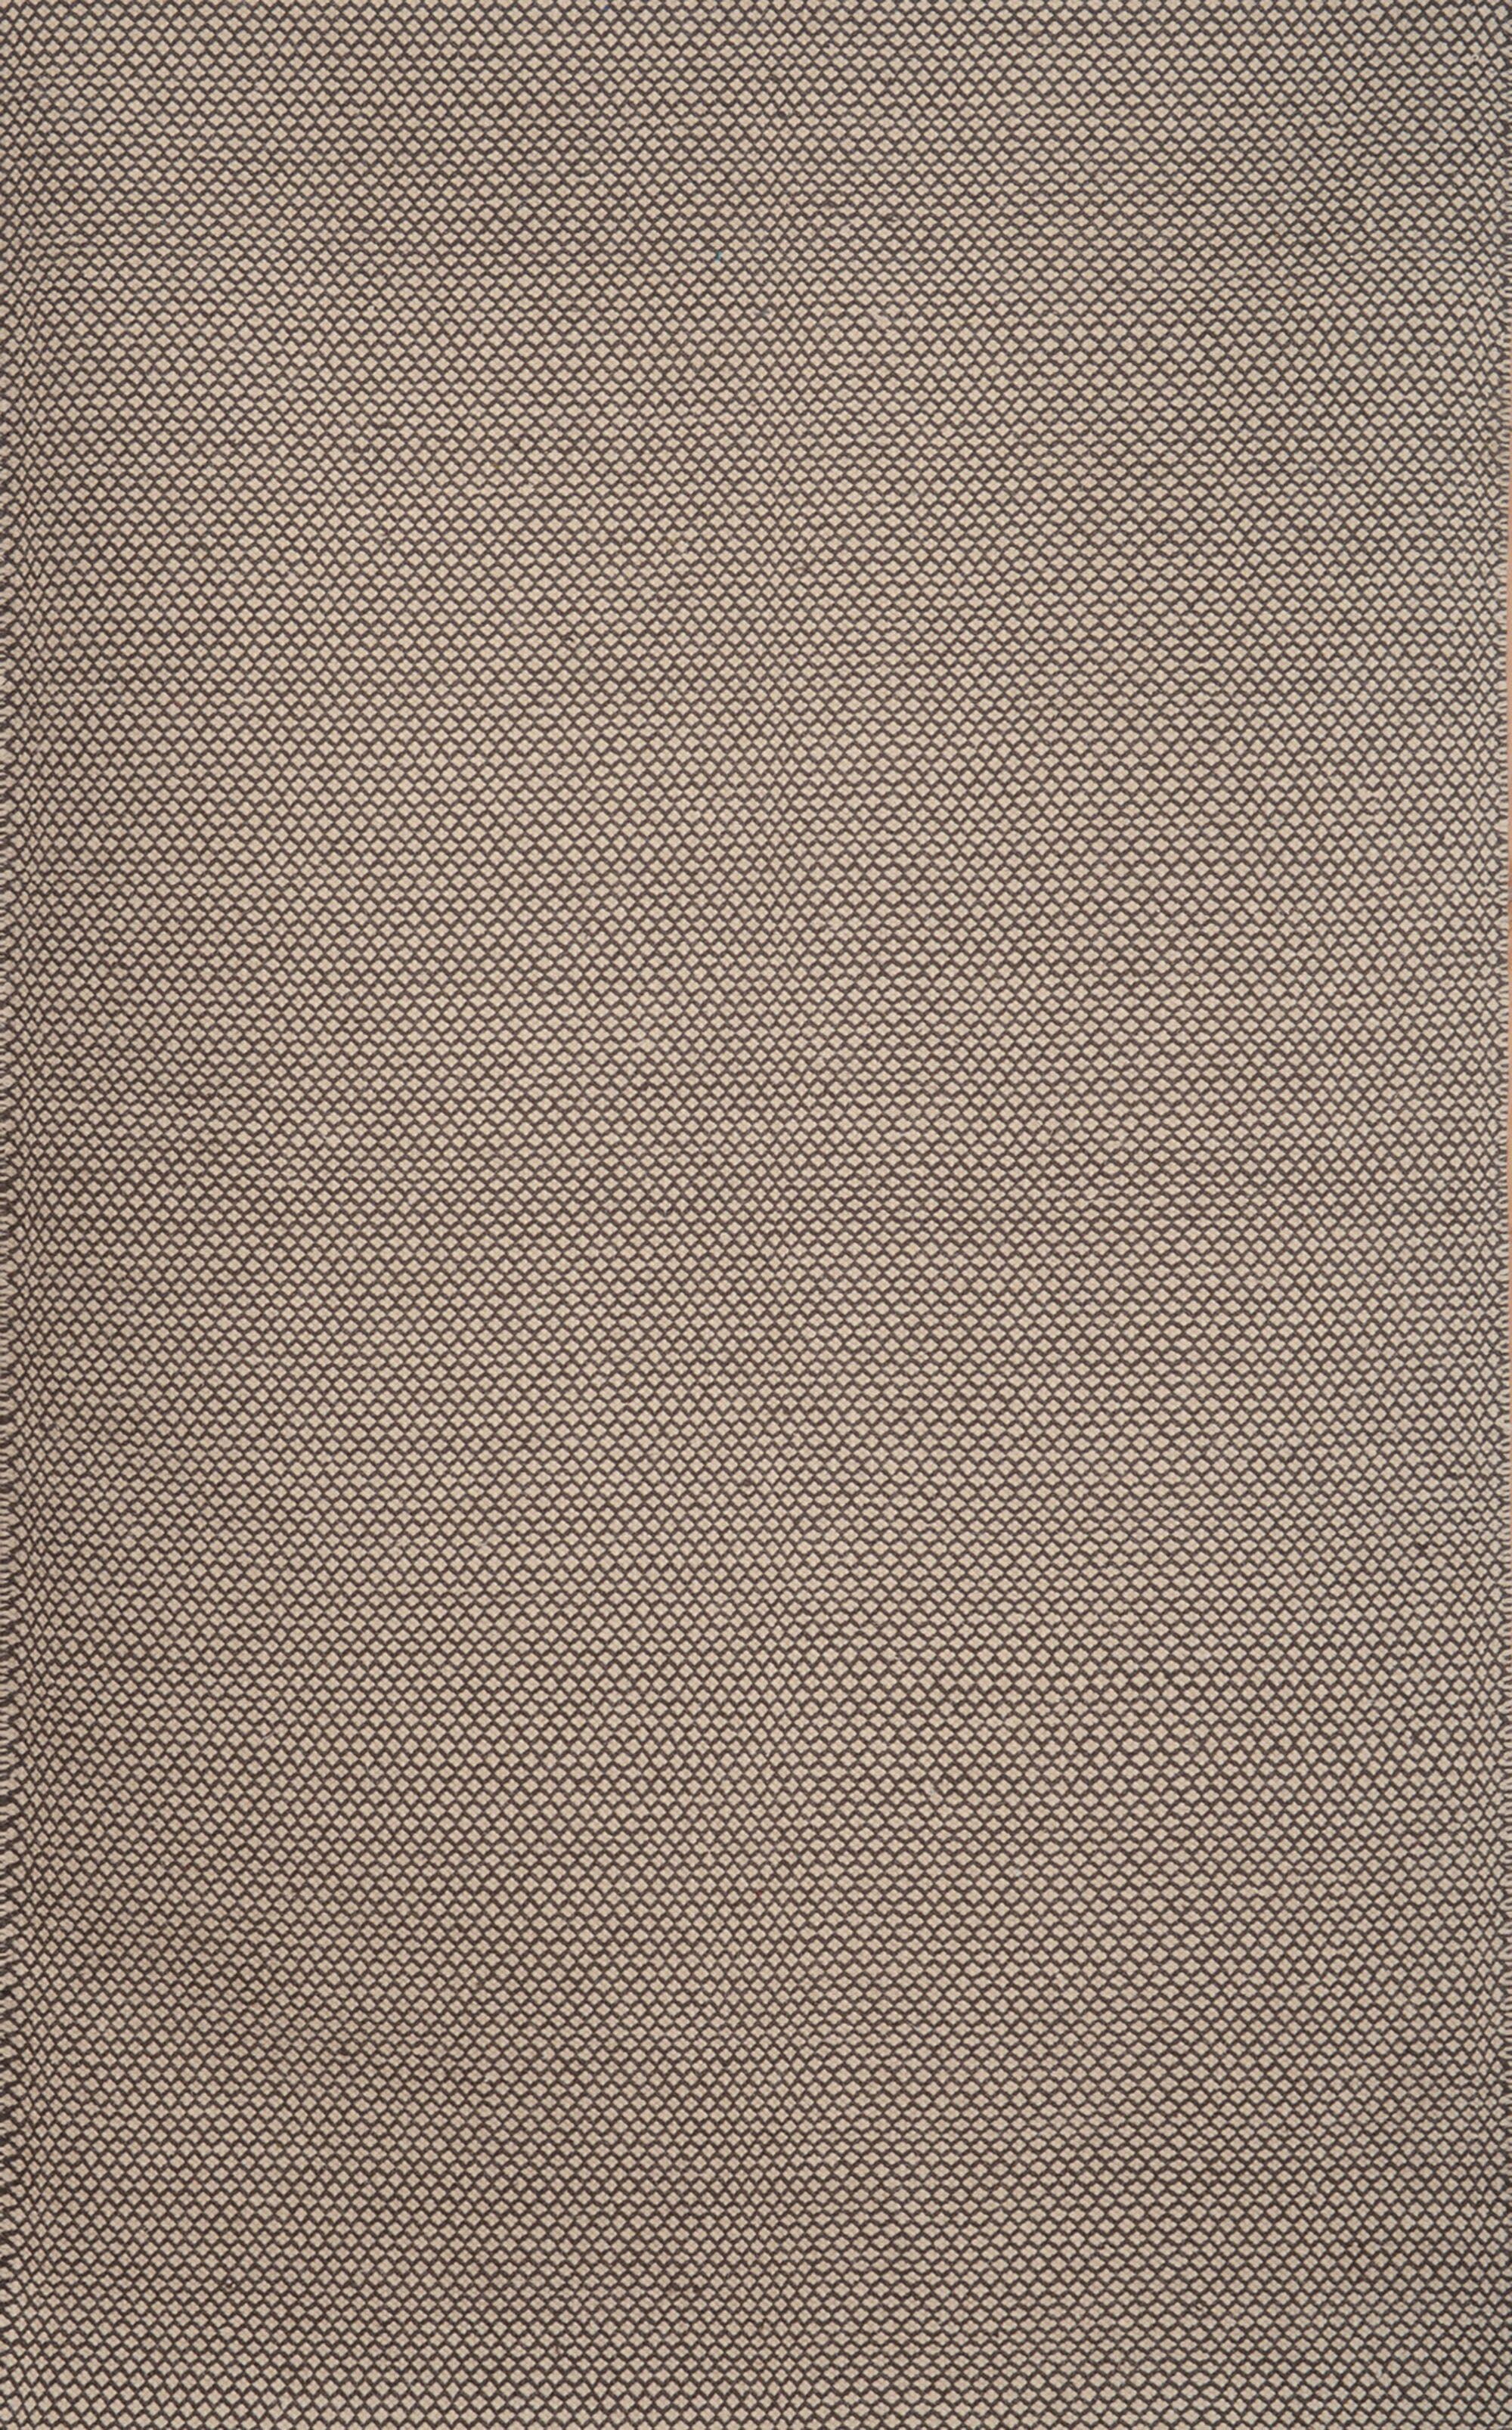 Hempstead Grey/White Rug Rug Size: 5' x 8'